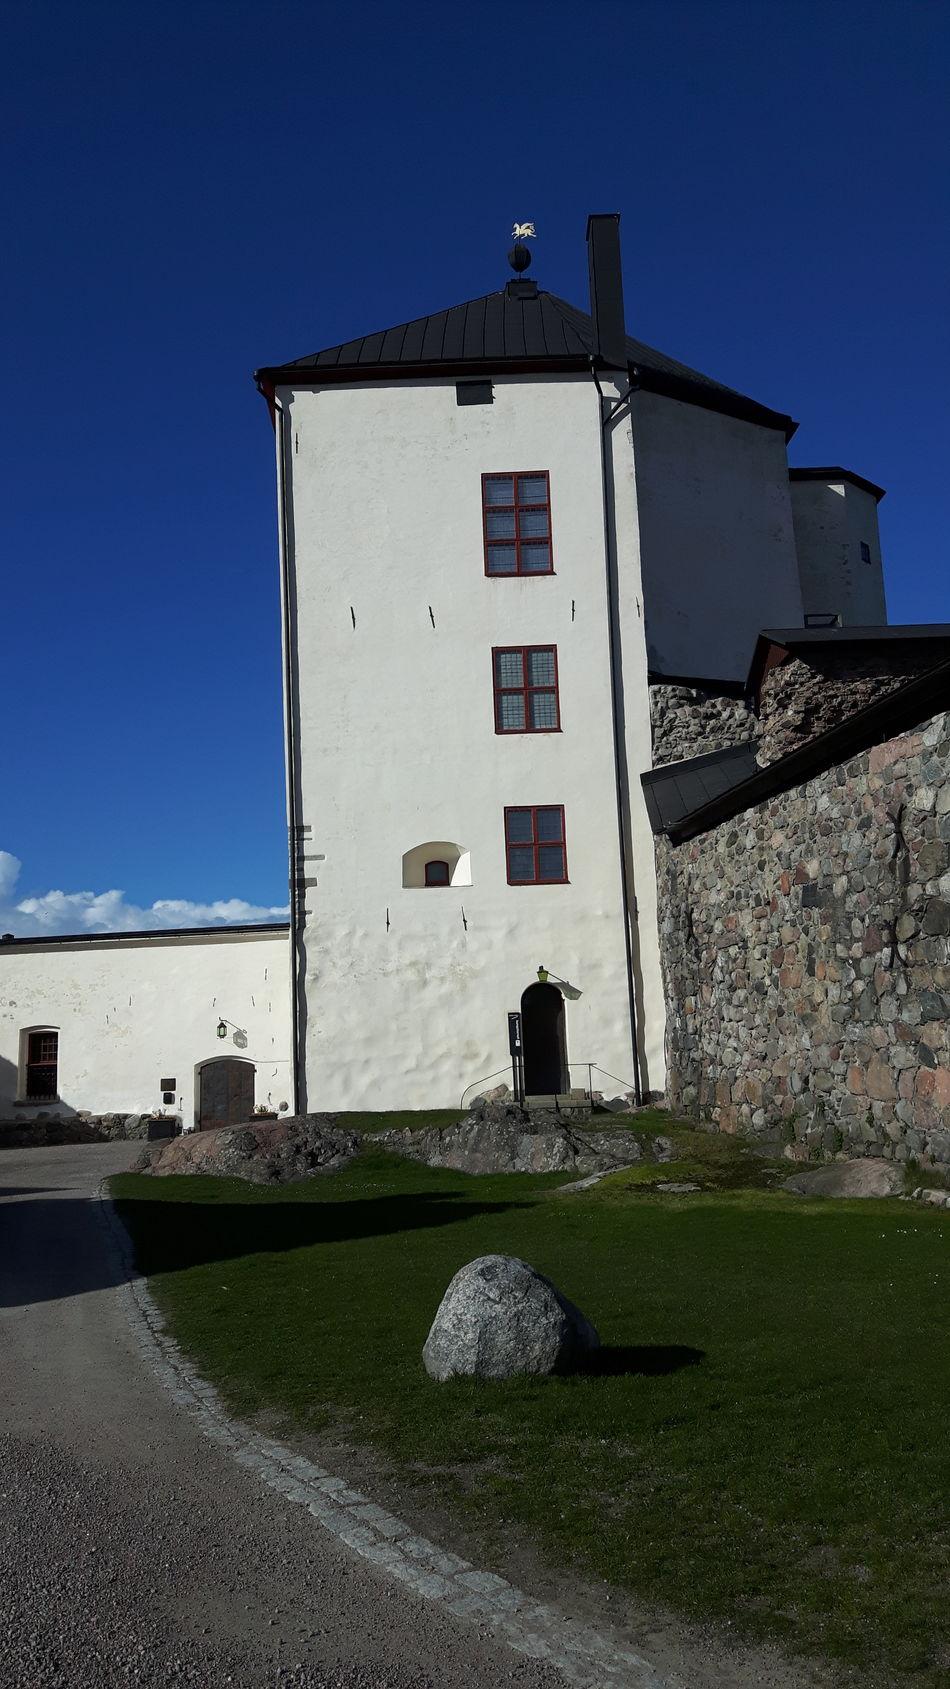 Built Structure Building Exterior Architecture No People Outdoors Nyköping Nyköpingshus Sweden Swedish Castle